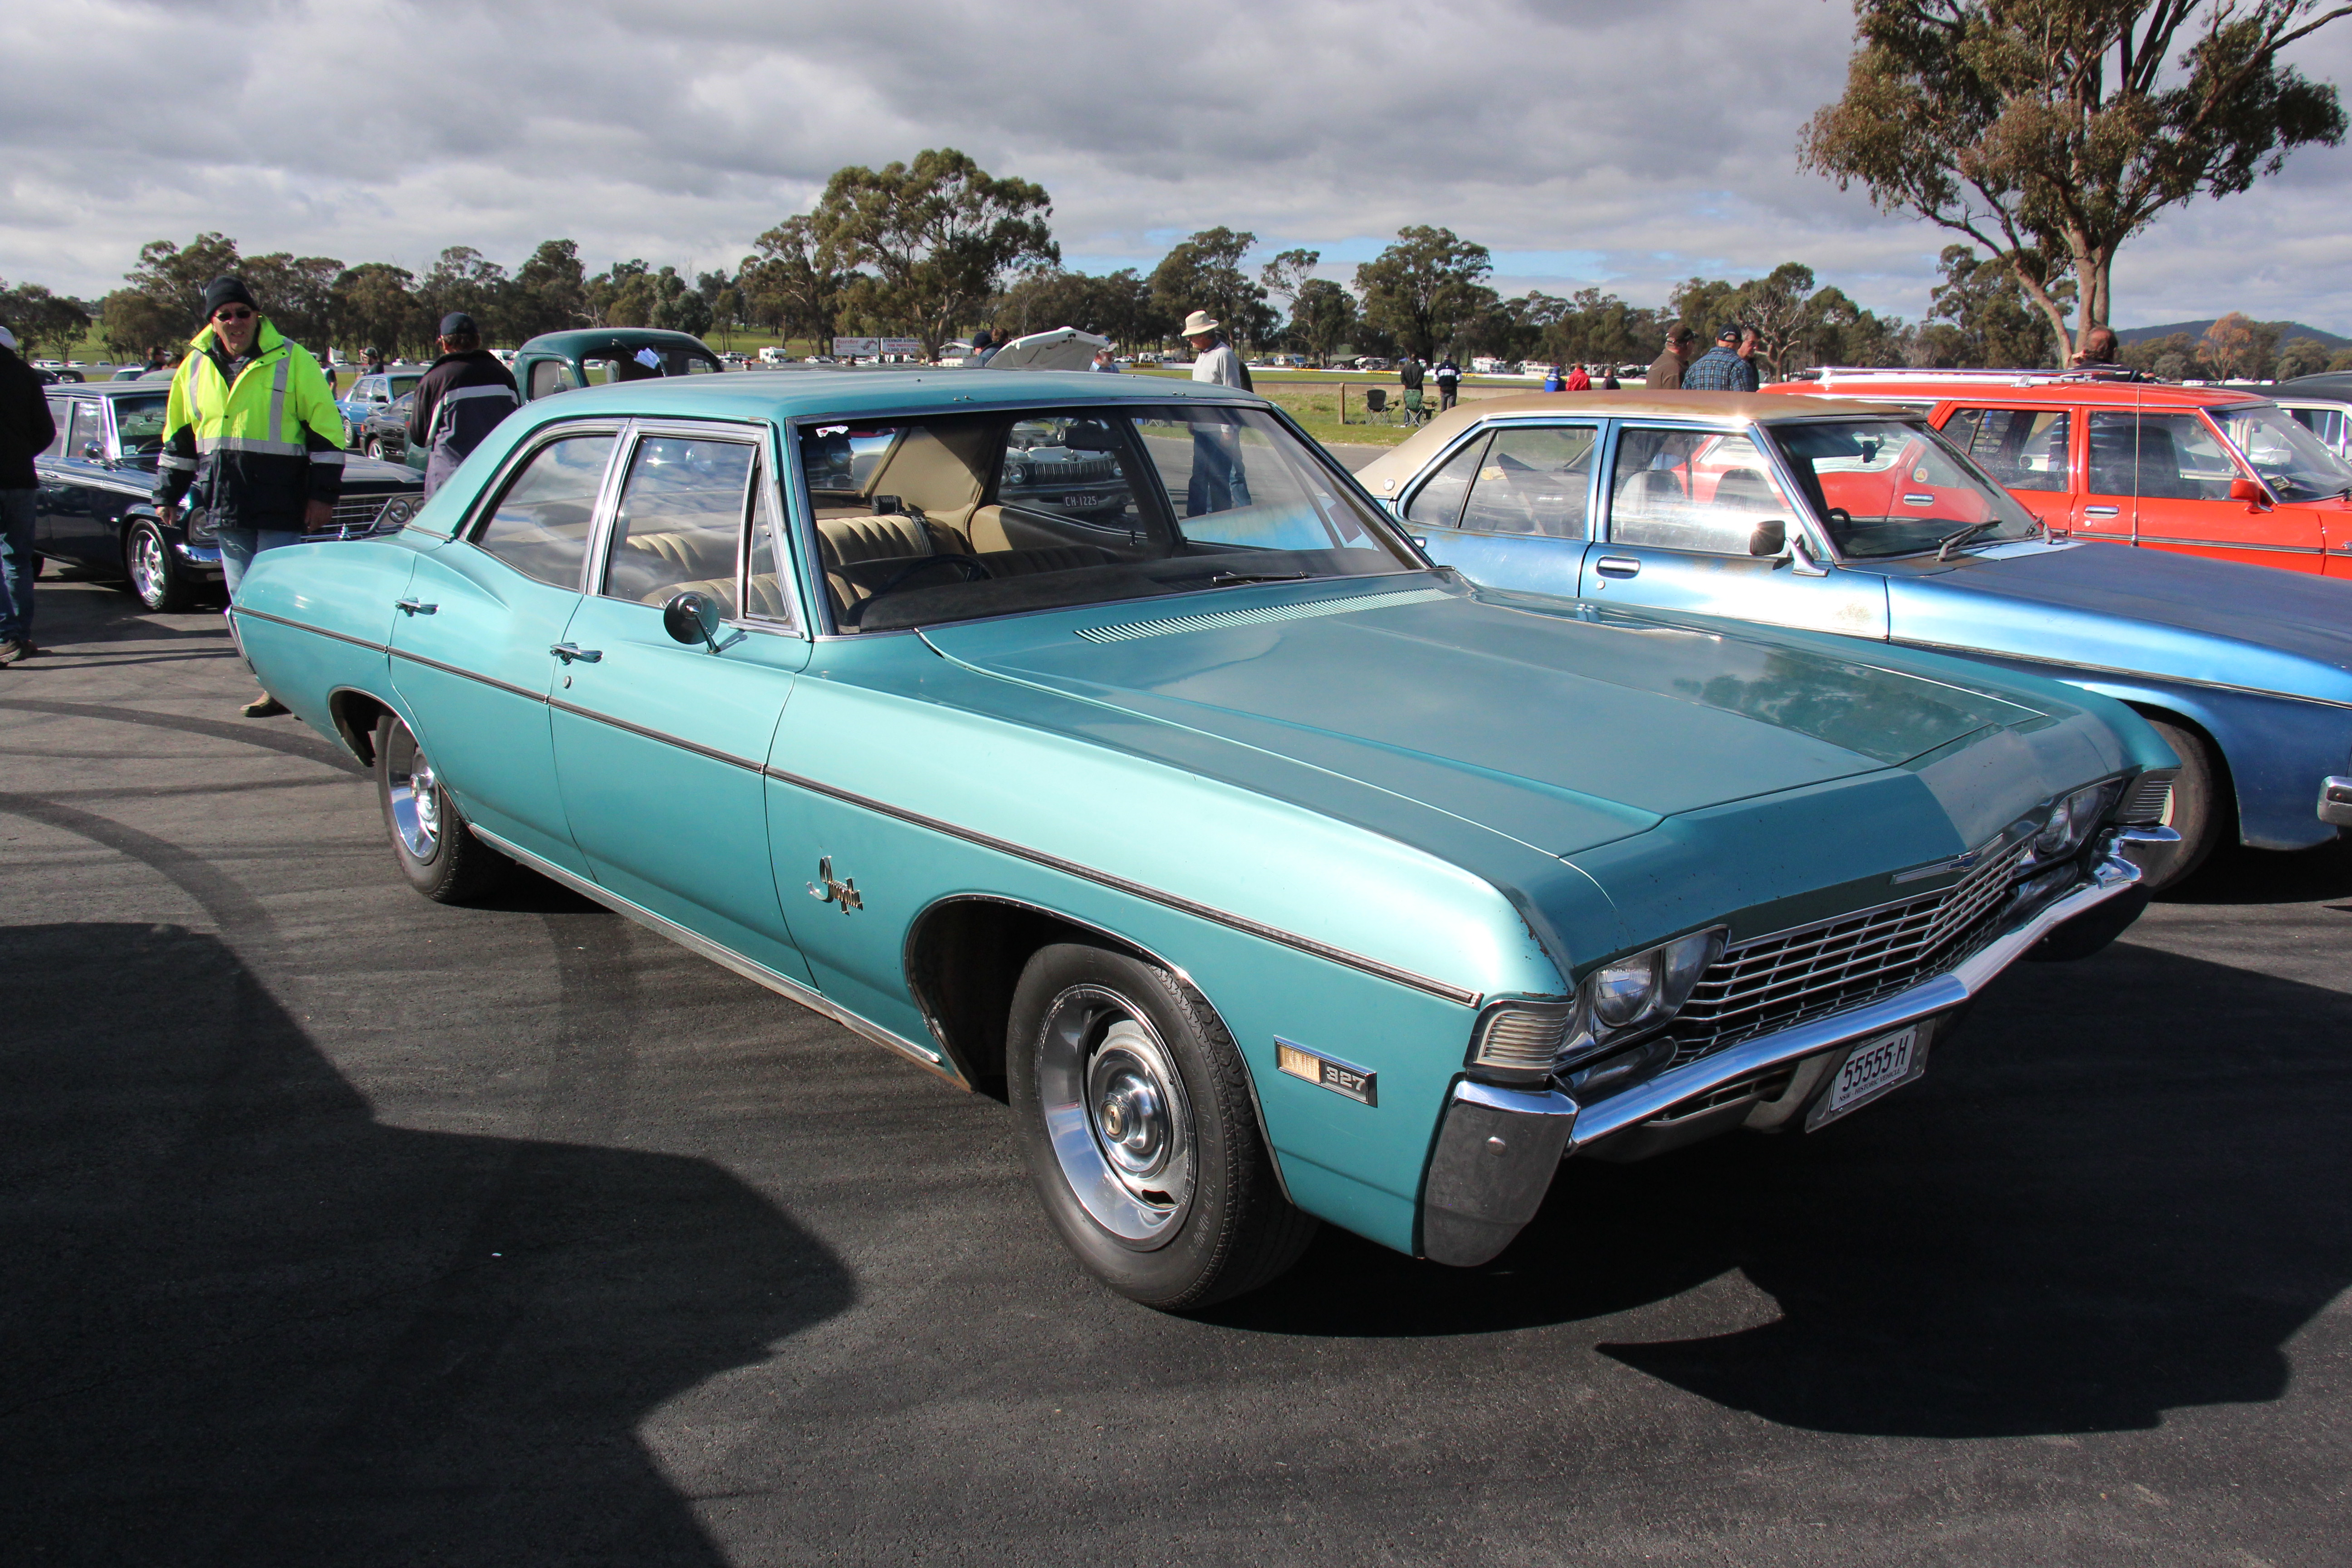 File 1968 Chevrolet Impala 4 Door Sedan 26804010573 Jpg Wikimedia Commons